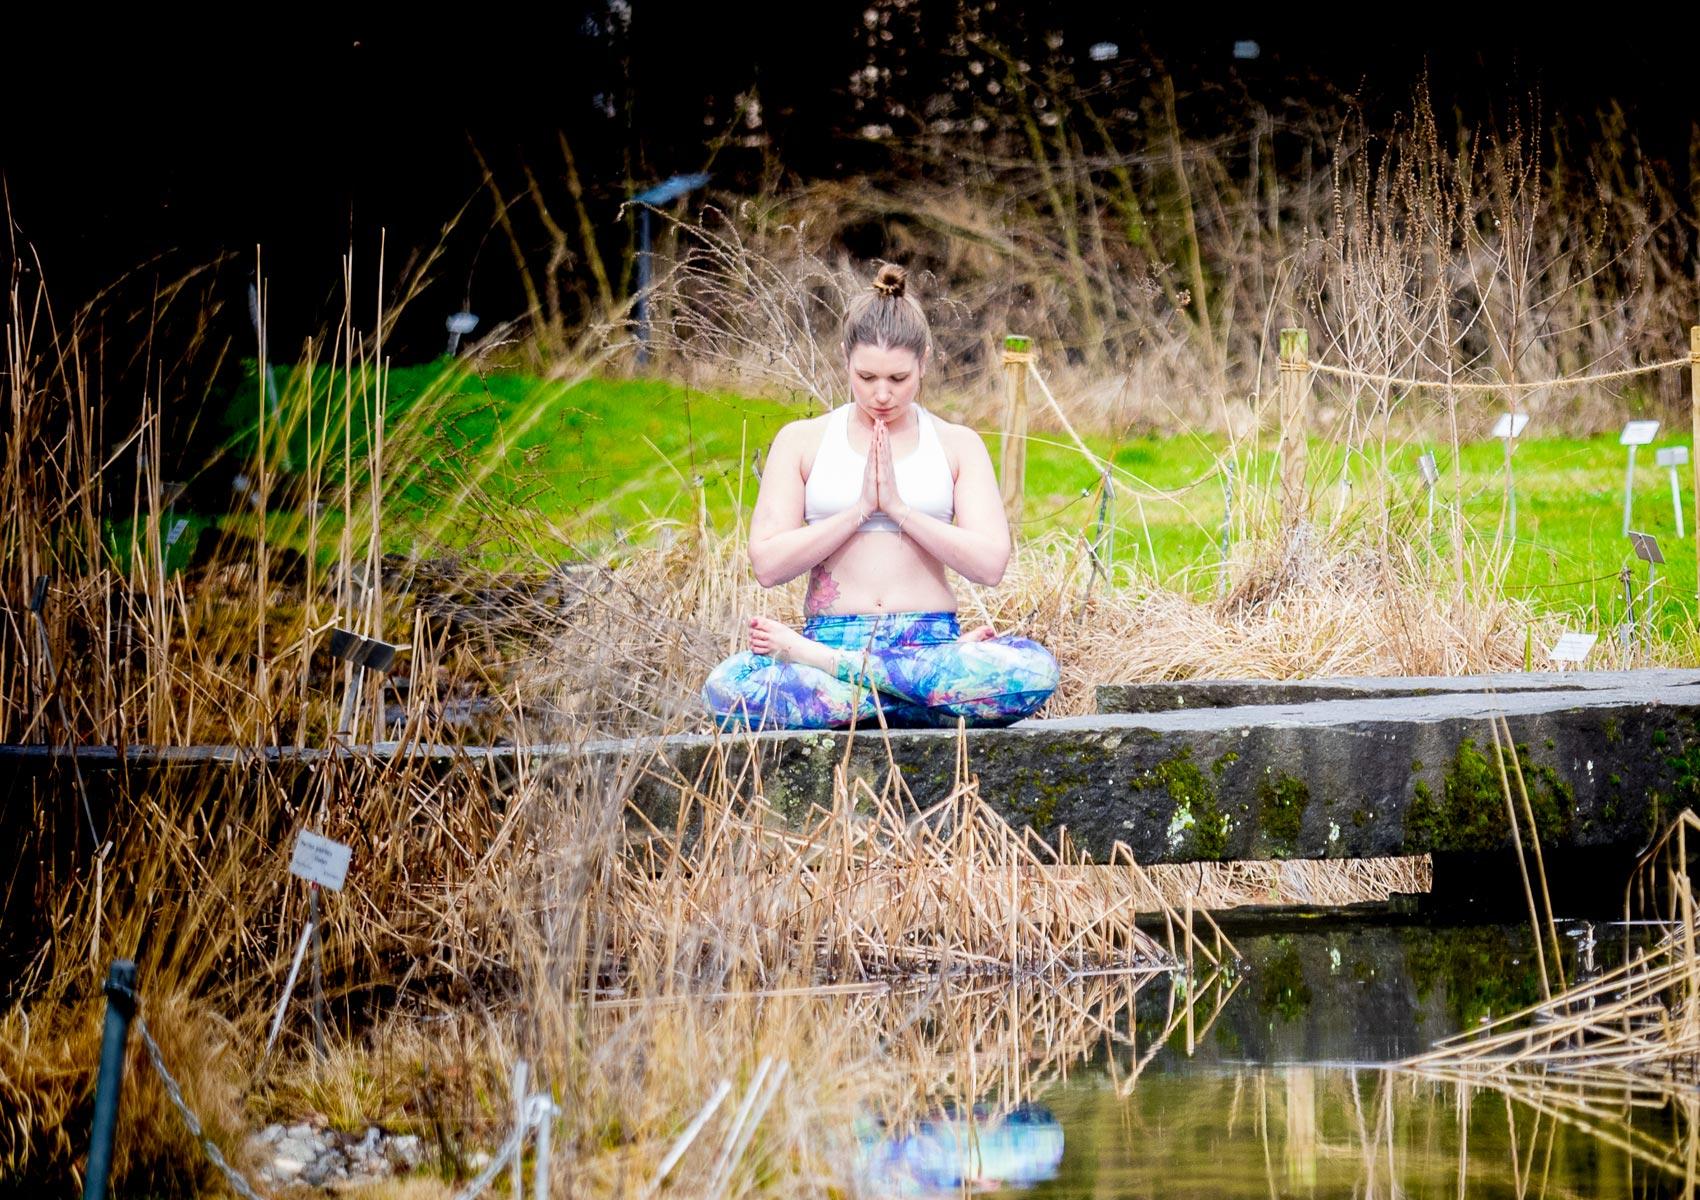 valis_tadasana_zermatt_yoga_zurich_botanical_gardens_02